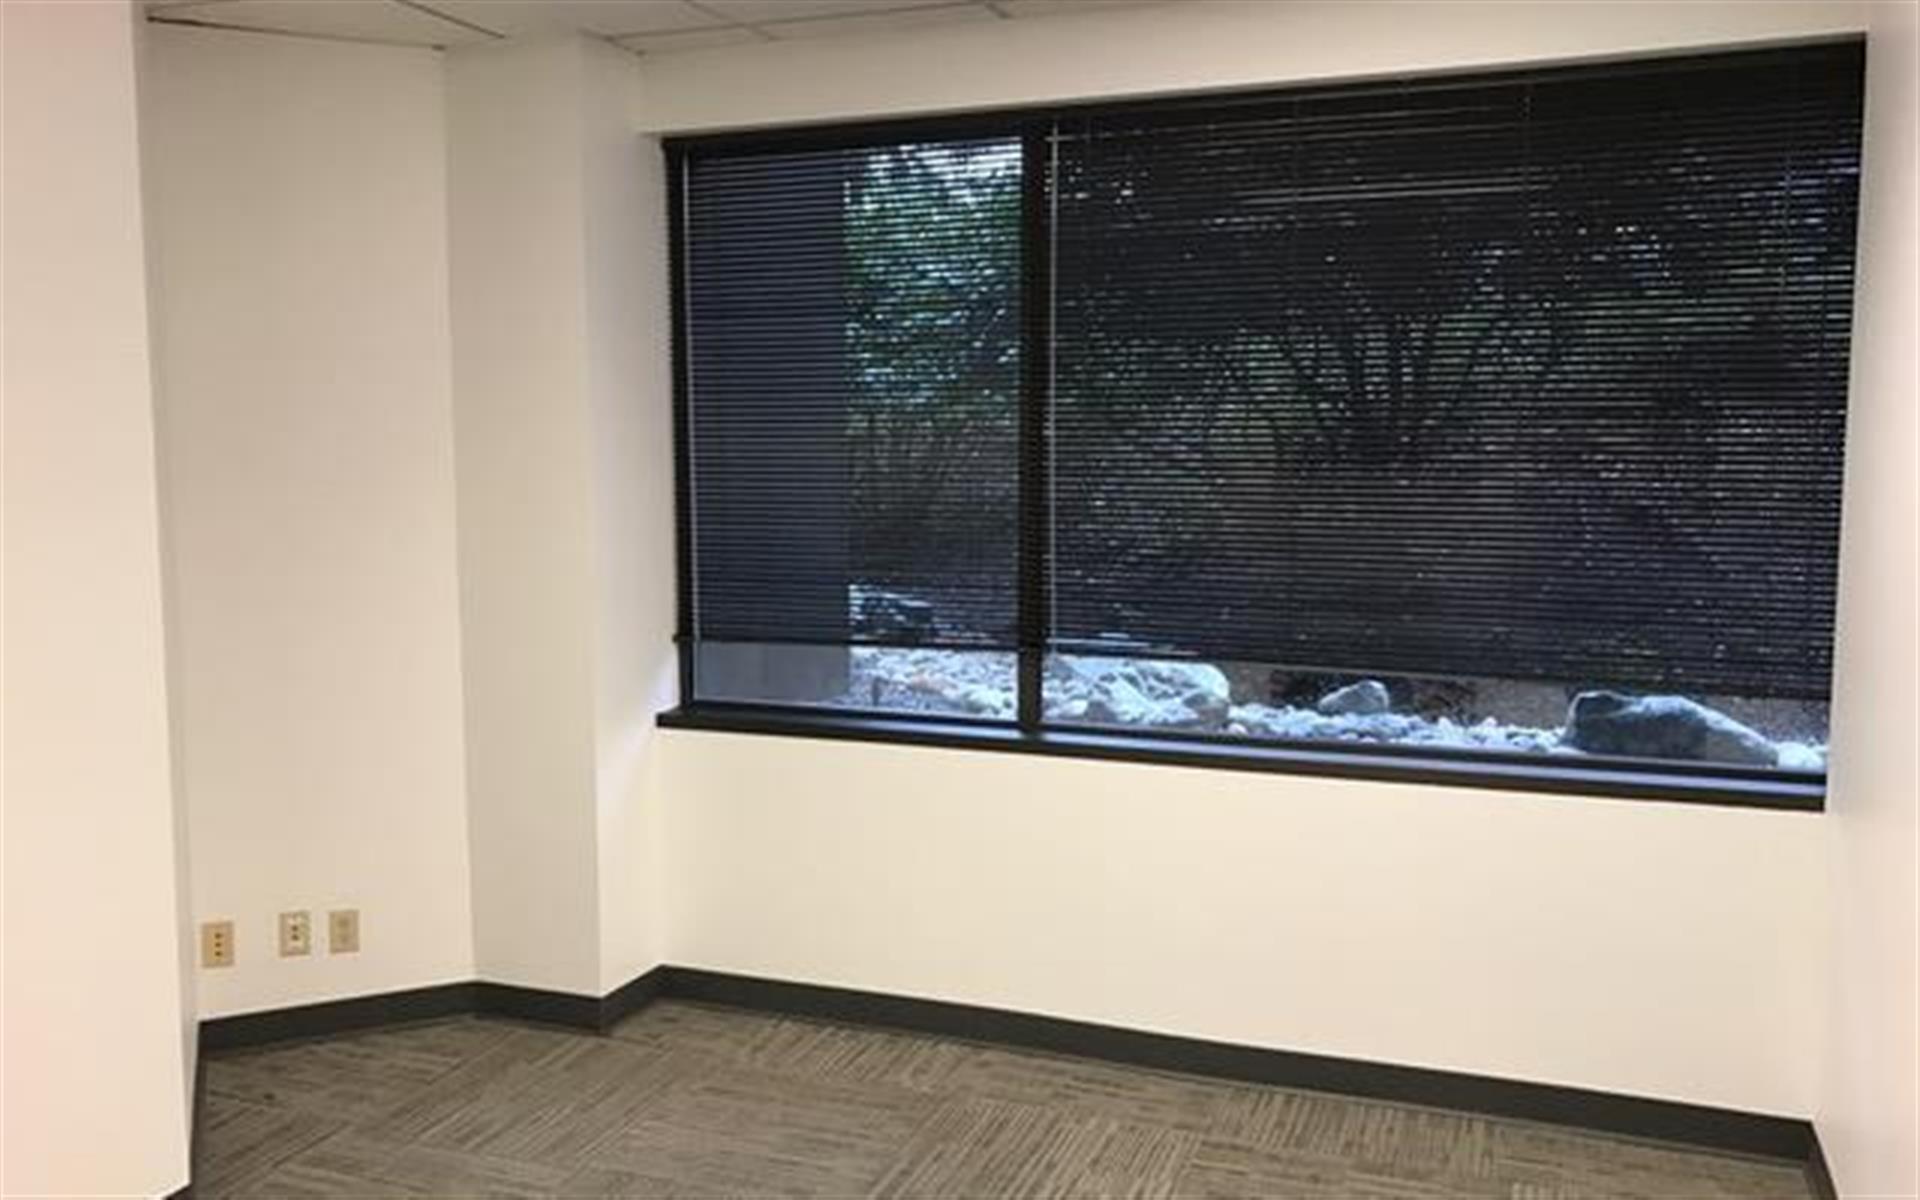 Office Space in Bellevue 405/520 Corridor - Window Office 1